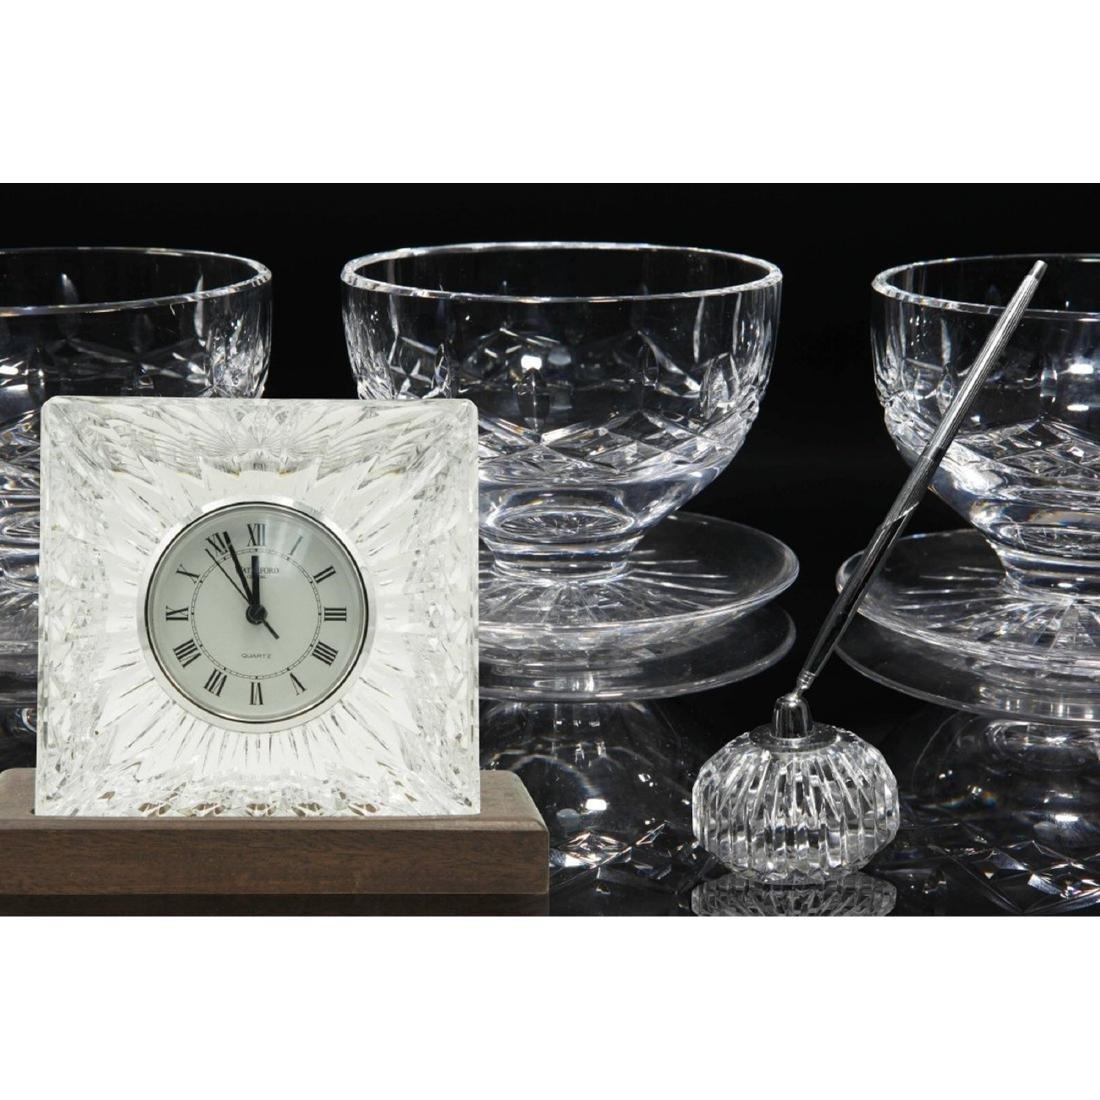 8PC WATERFORD LISMORE GLASSES, CLOCK, PEN HOLDER